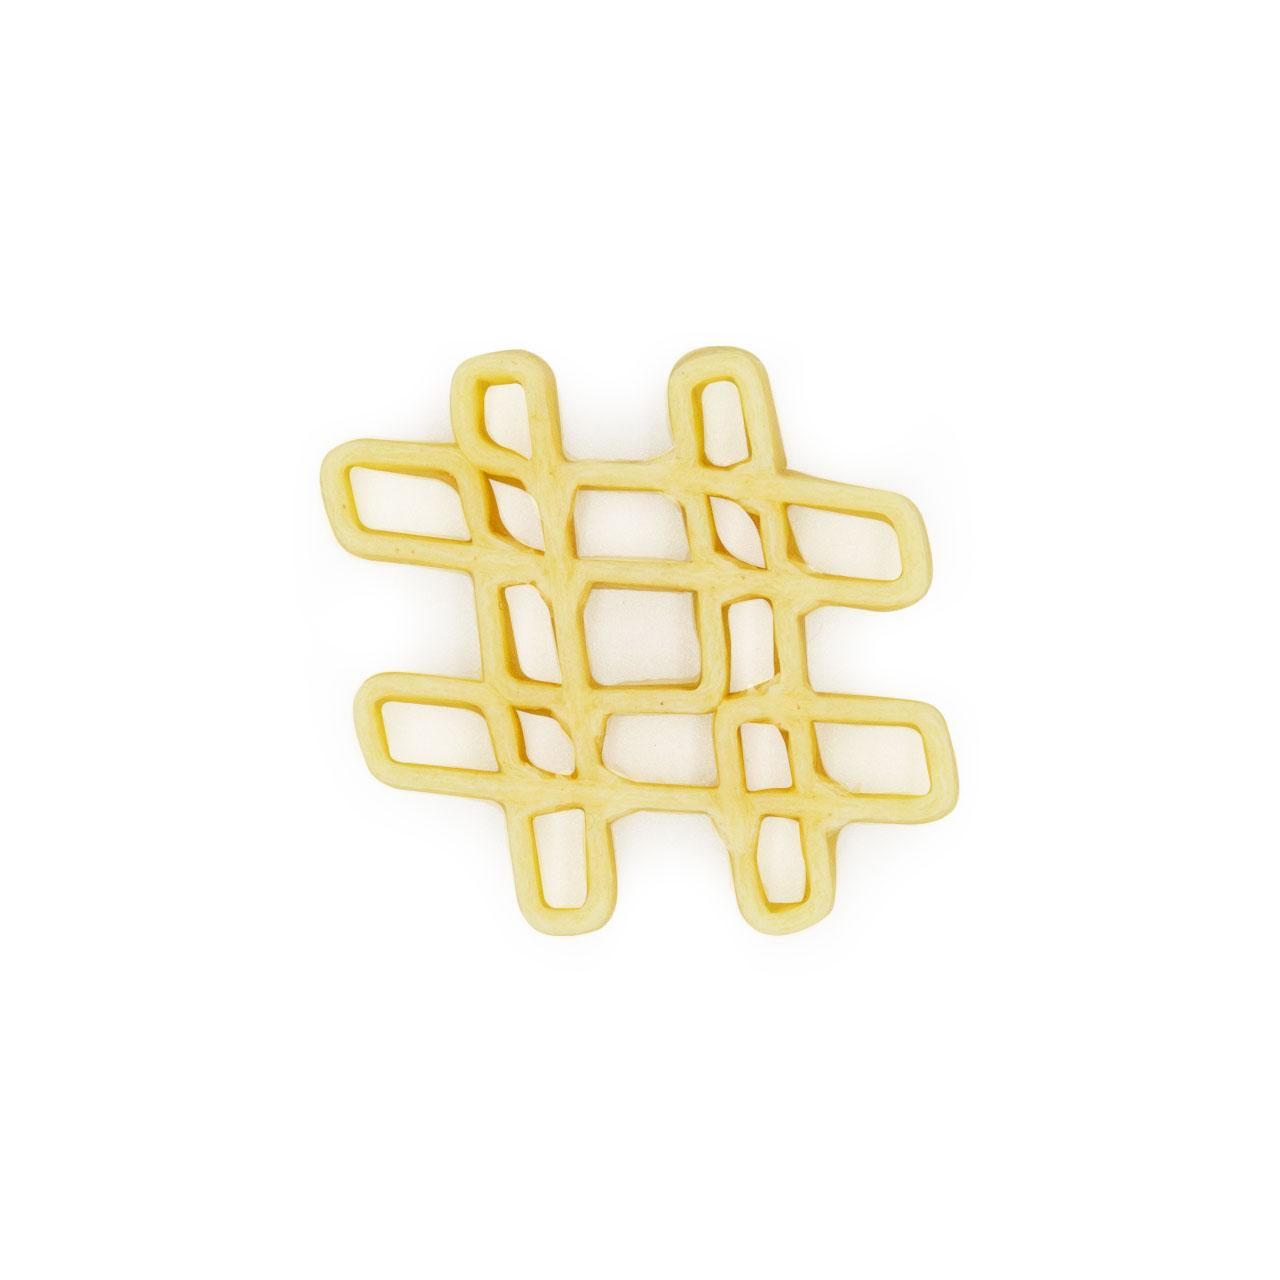 Hashtag di pasta